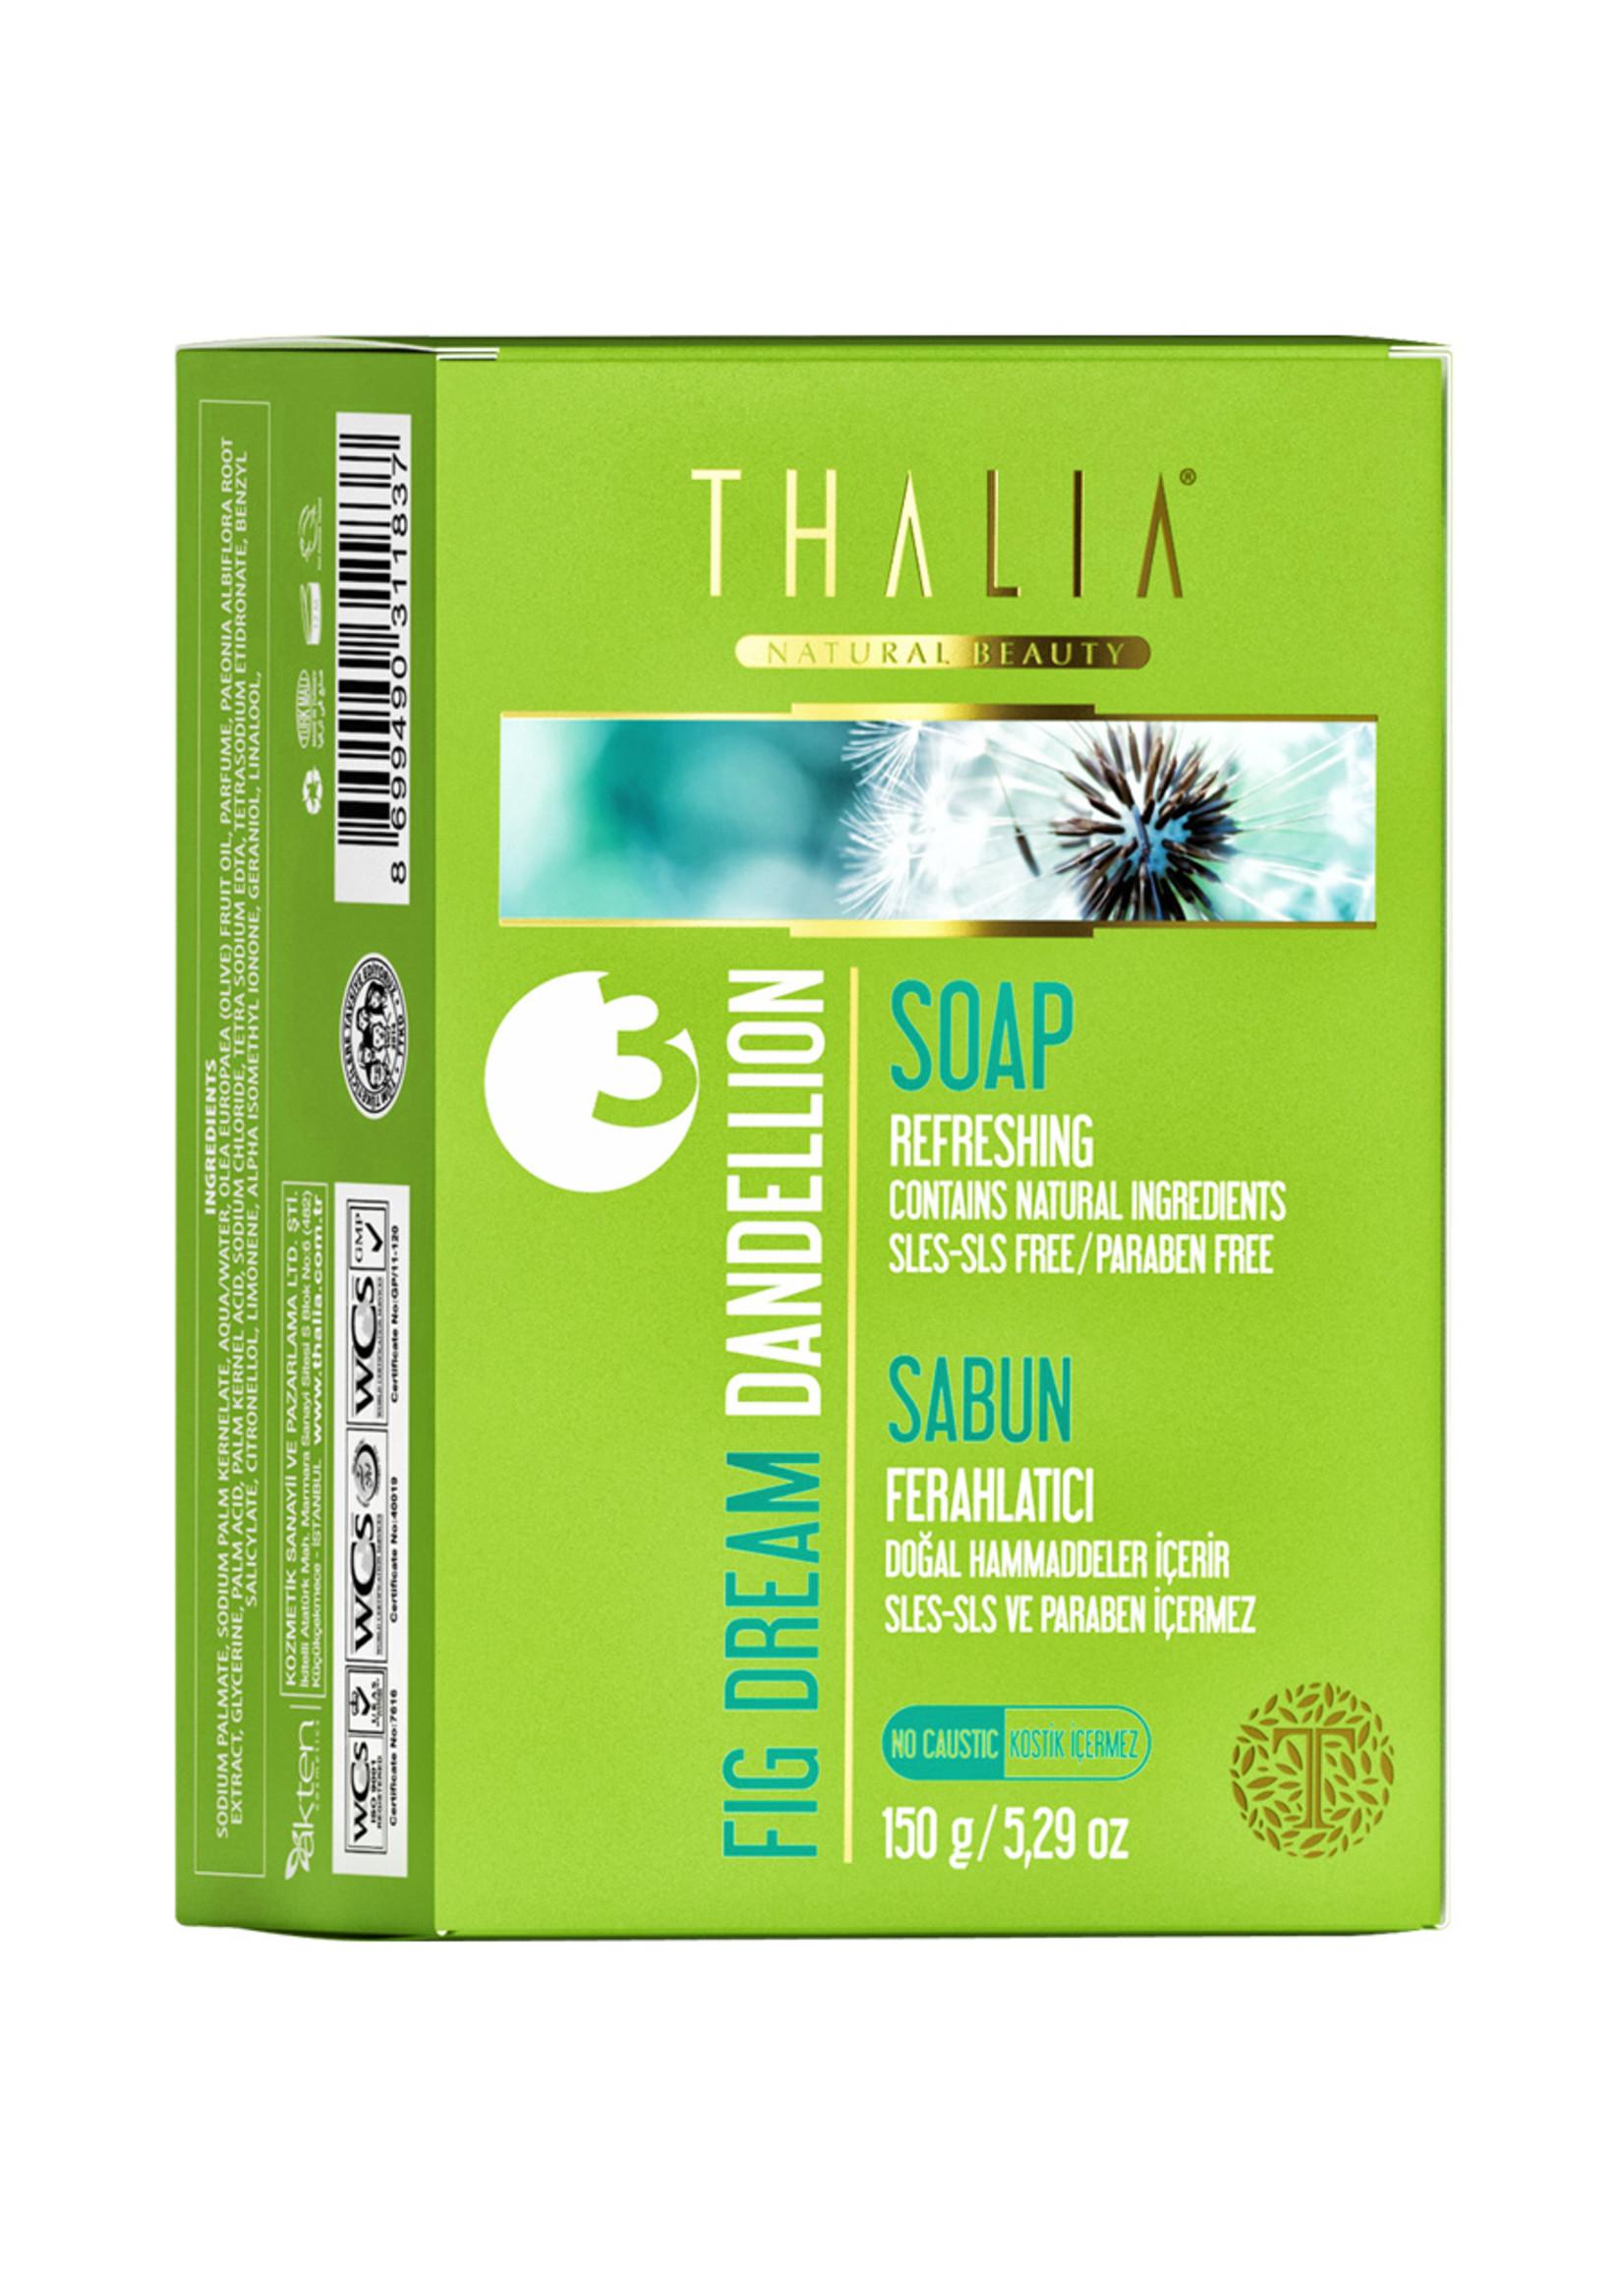 Thalia Paardenbloem Zeep 150 gr